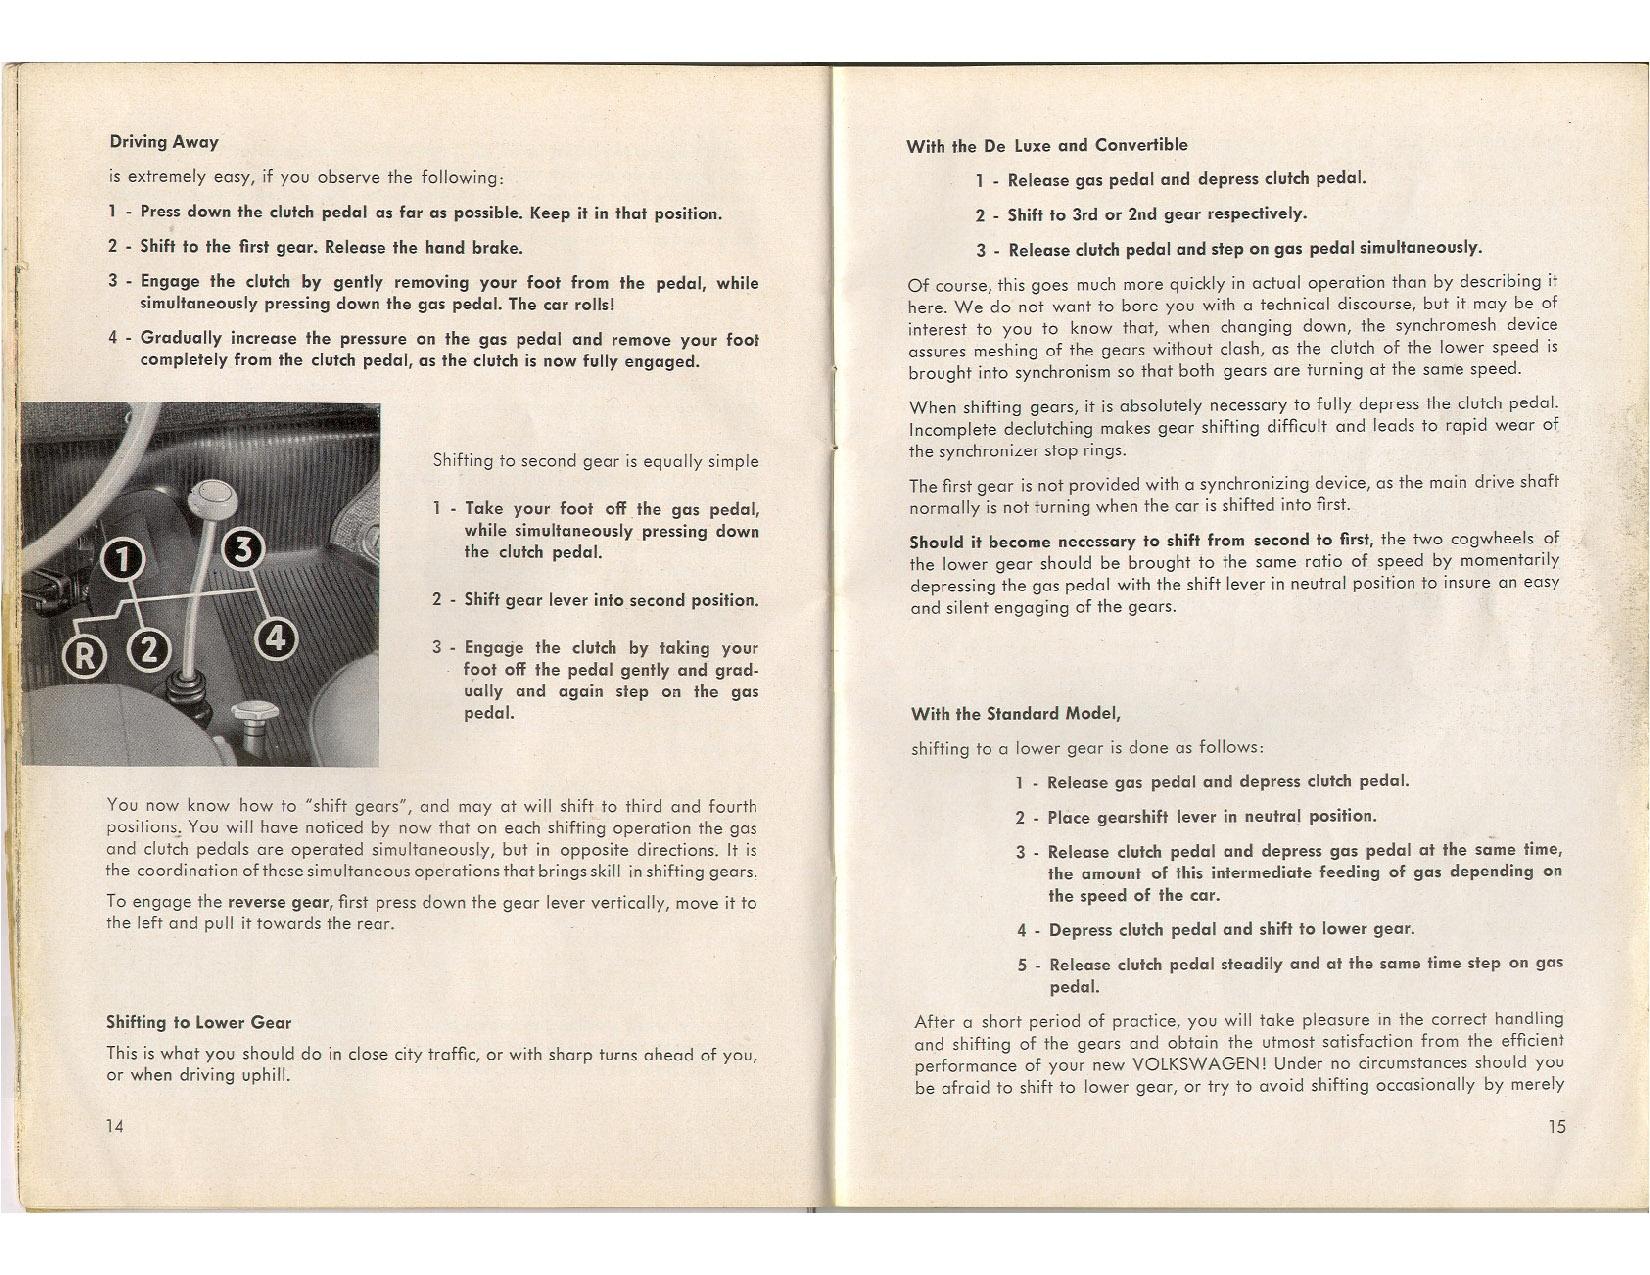 thesamba com august 1955 1956 vw bug owner s manual rh thesamba com 1970 vw beetle owners manual pdf vw beetle owners manual pdf